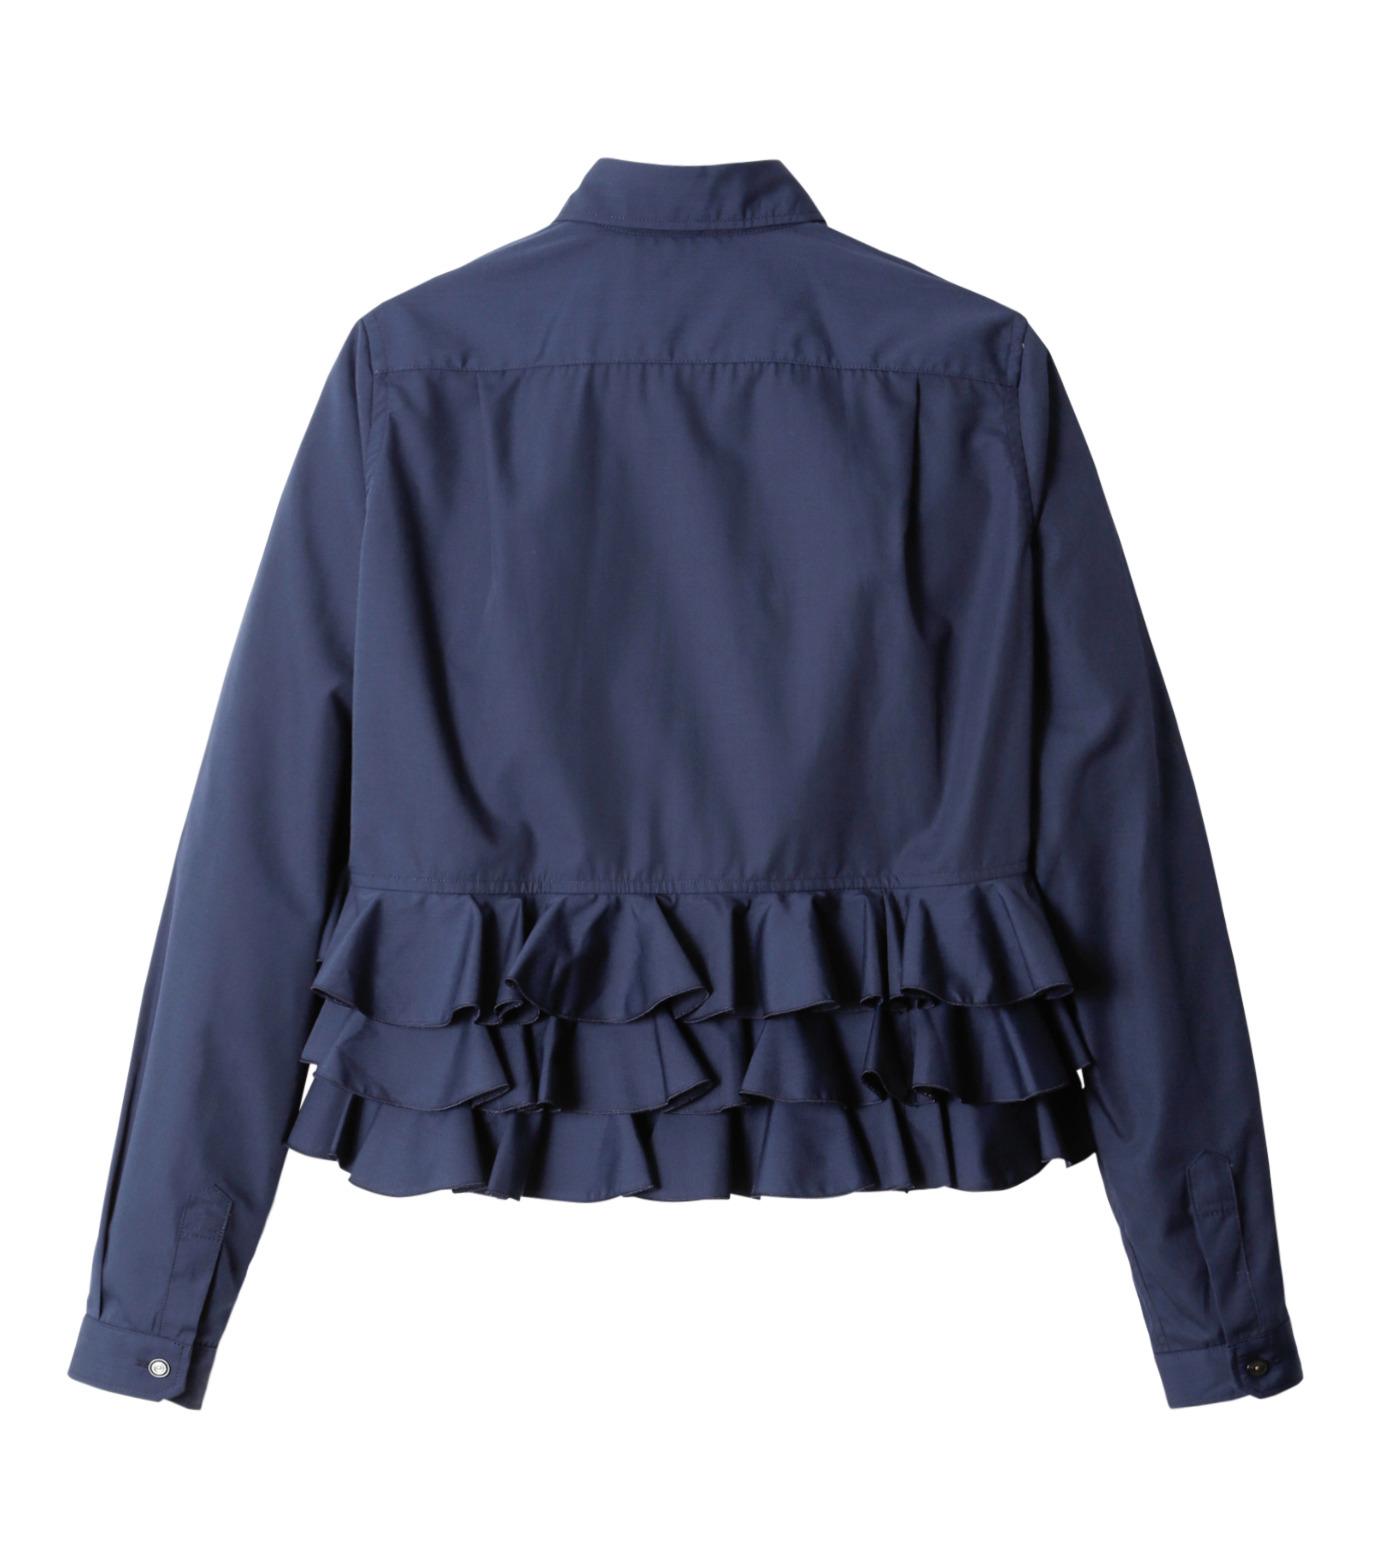 KOLOR(カラー)のShirt w/Back Ruffle Detail-NAVY(シャツ/shirt)-16WCL-B02134-93 拡大詳細画像6